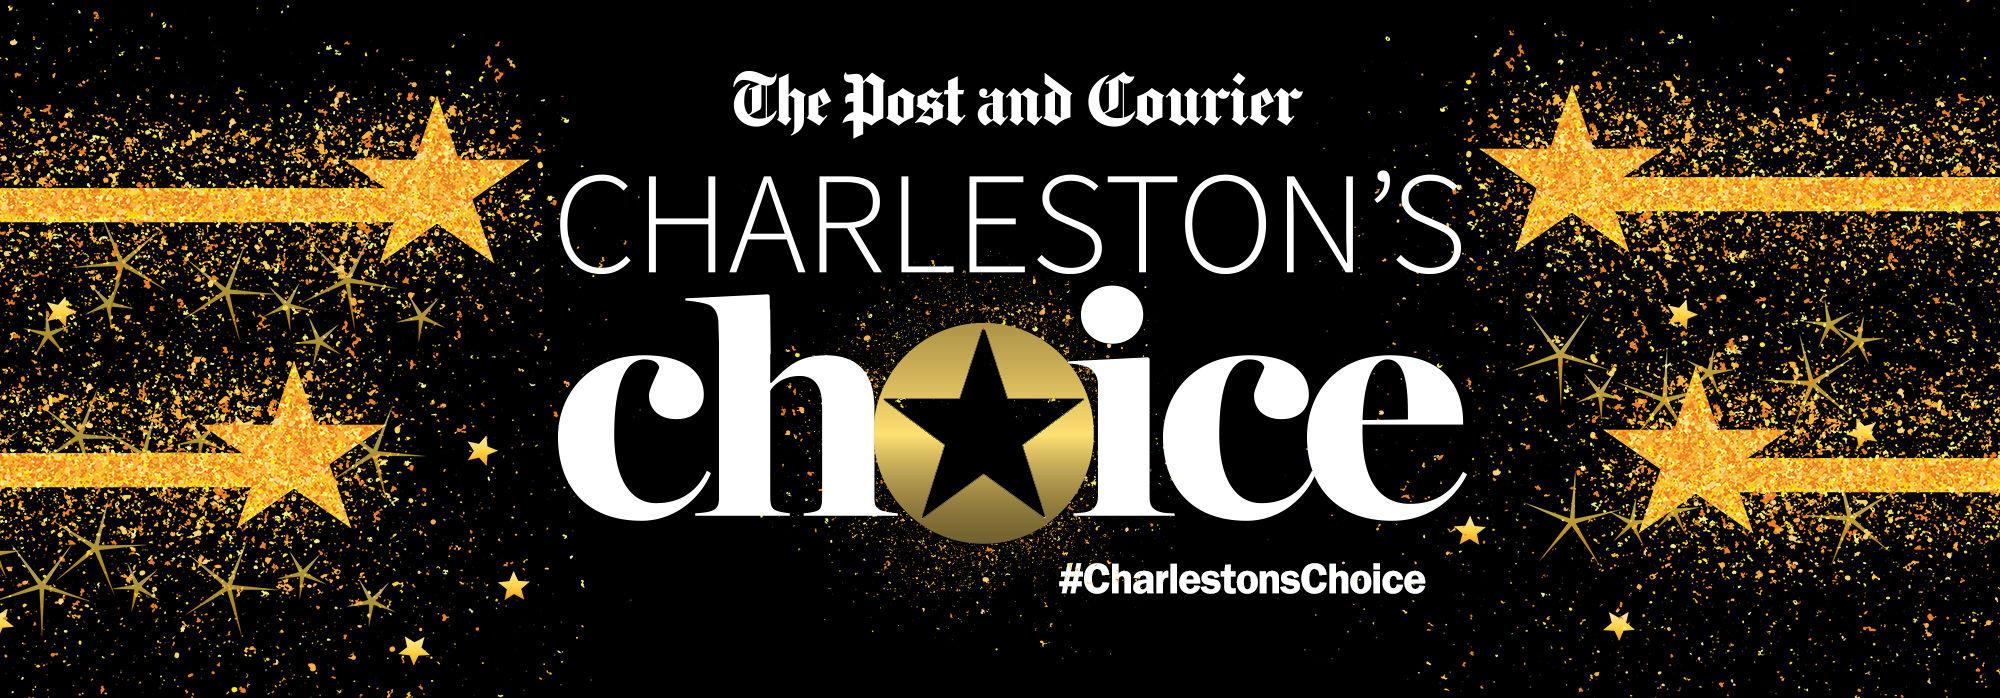 charleston choice award